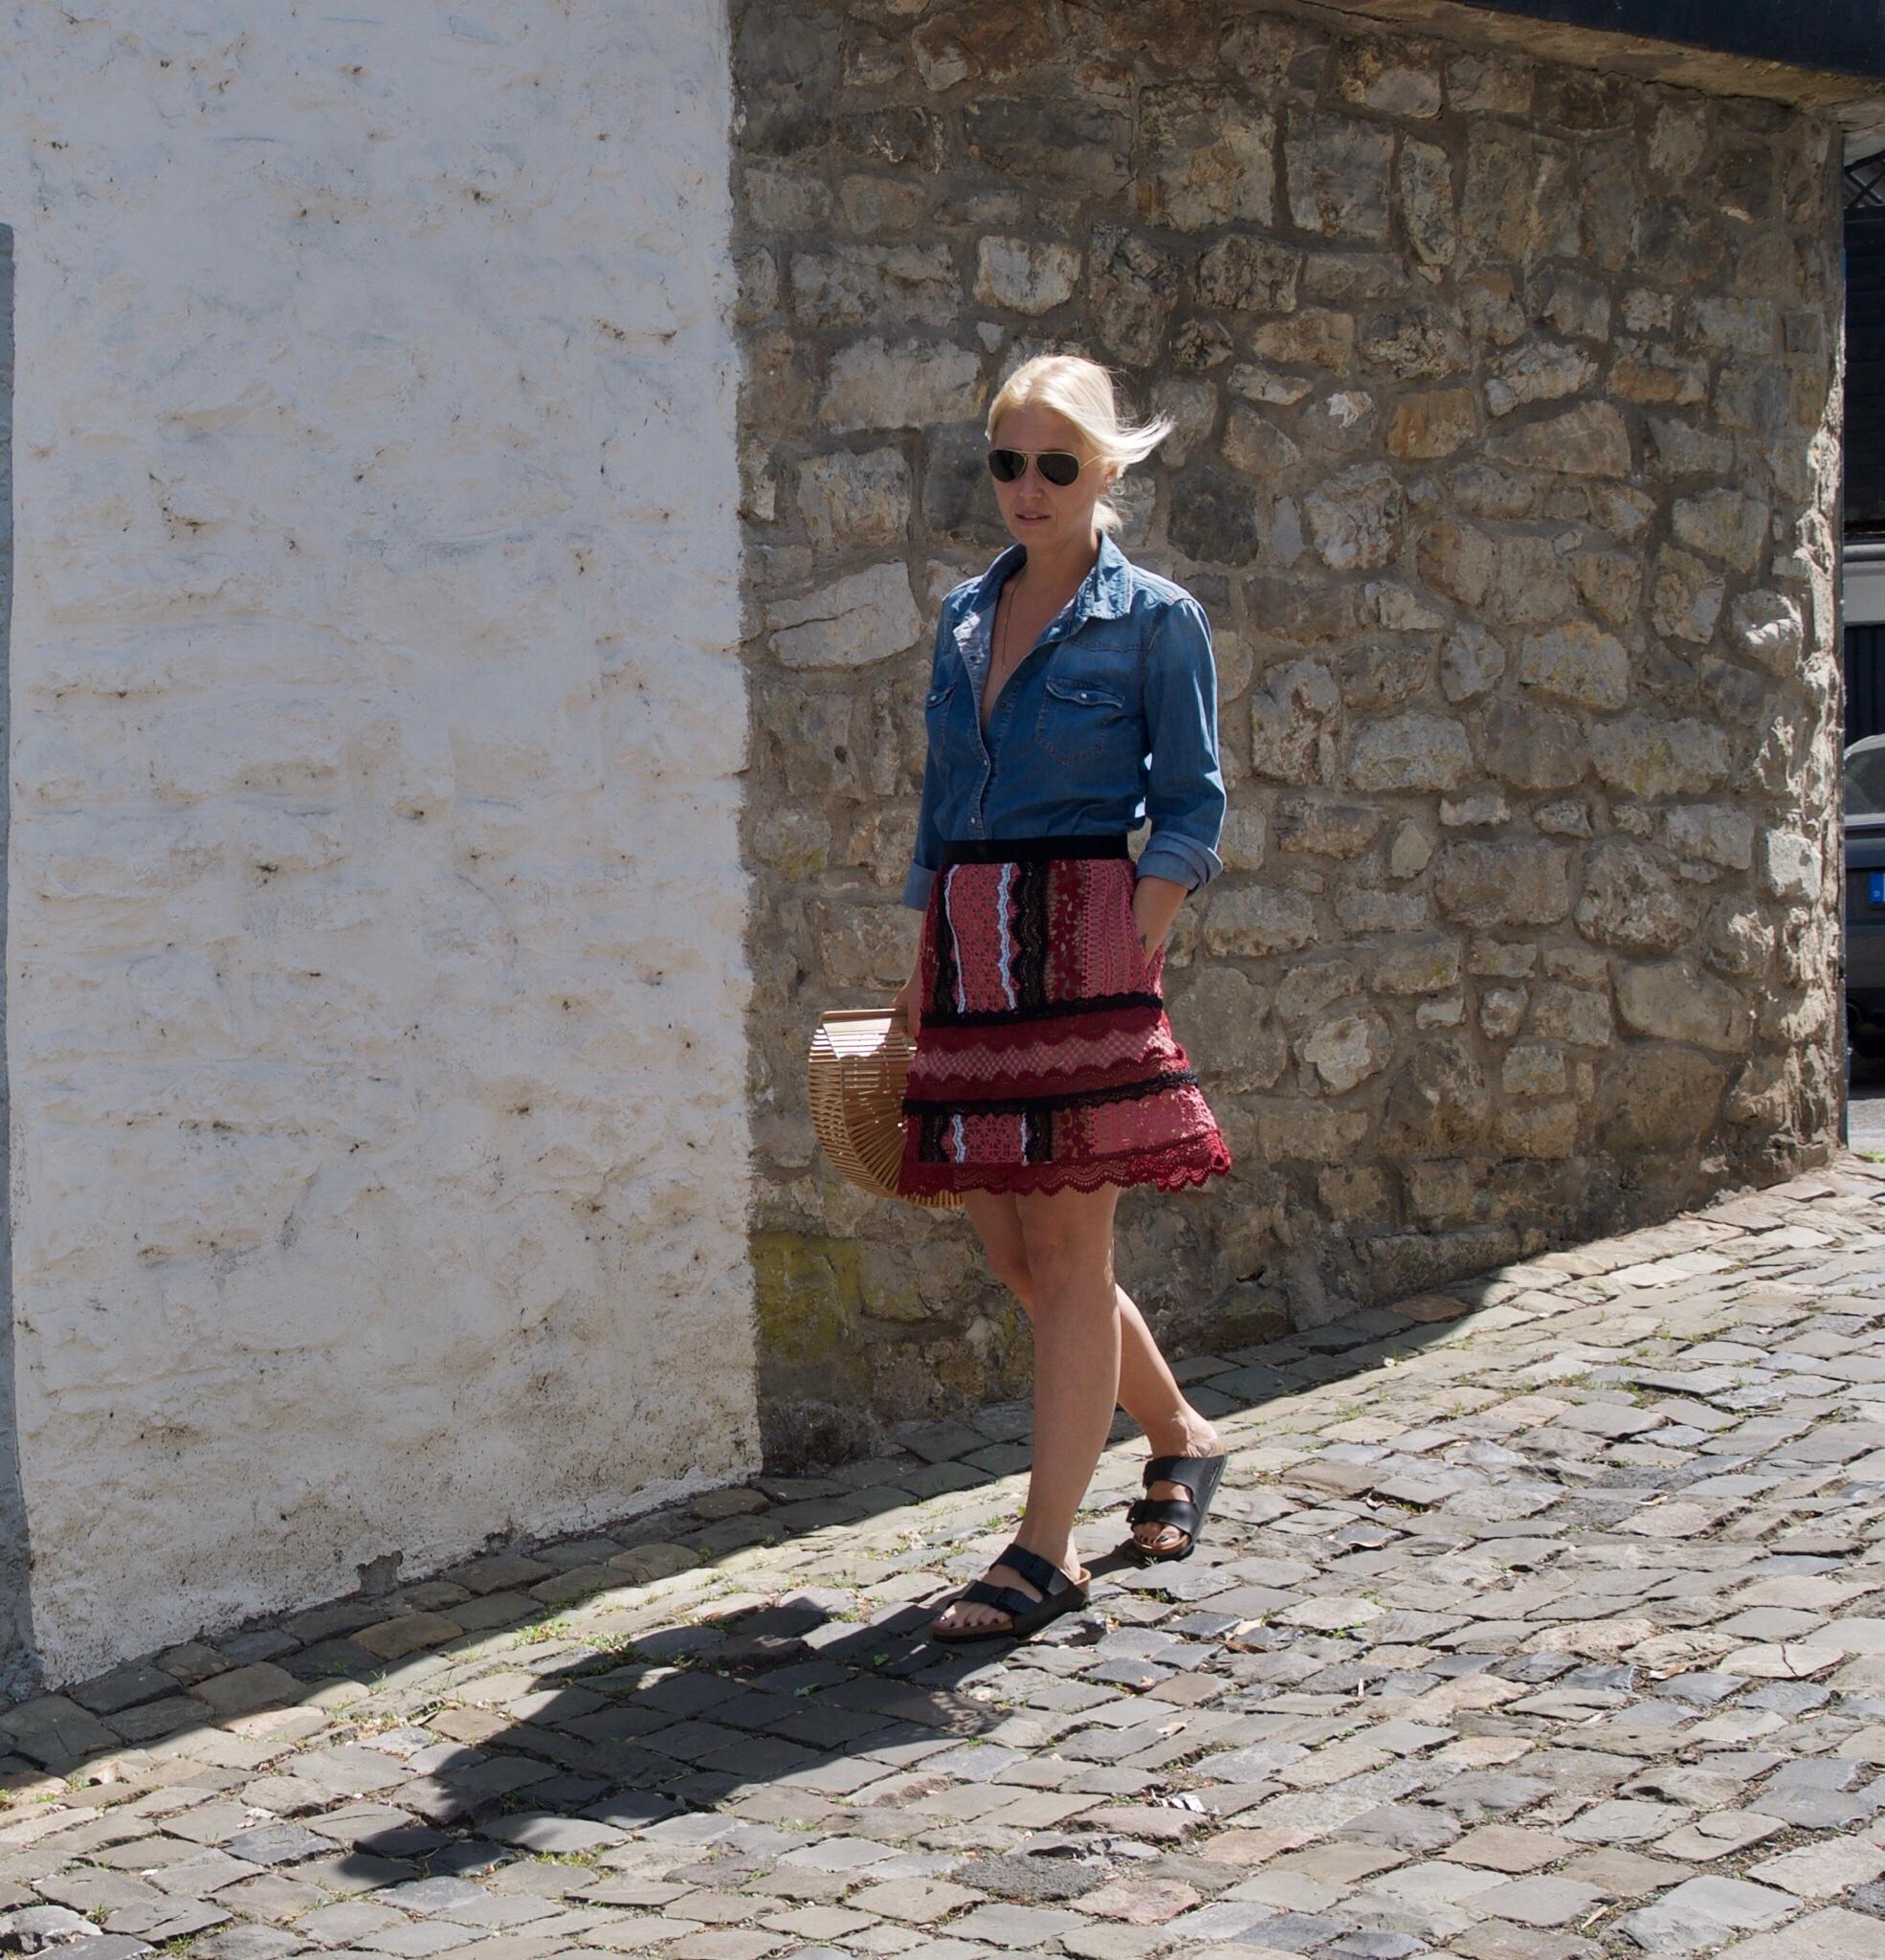 Self-Portrait skirt with Bamboo Bag